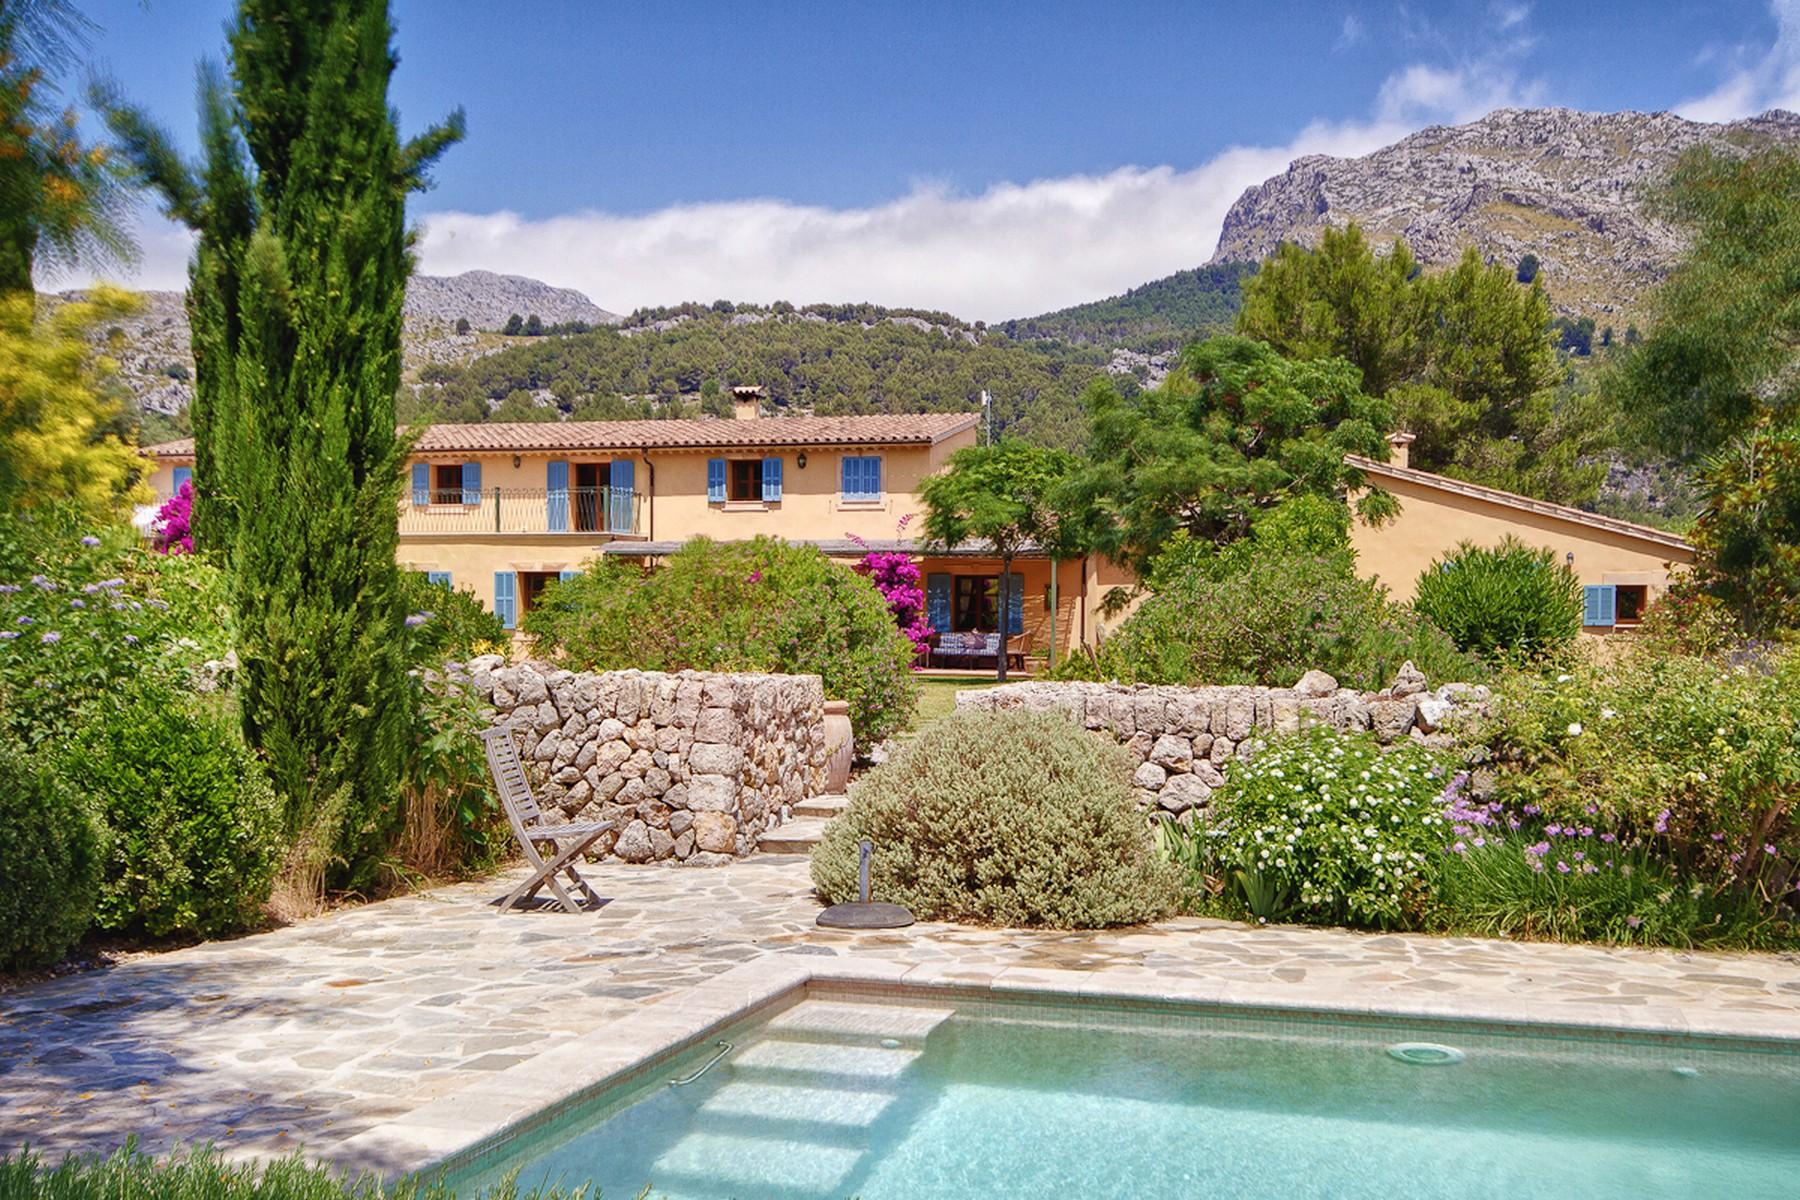 Ferme / Ranch / Plantation pour l Vente à Idyllic historic country Finca in Pollensa Pollensa, Majorque, 07460 Espagne